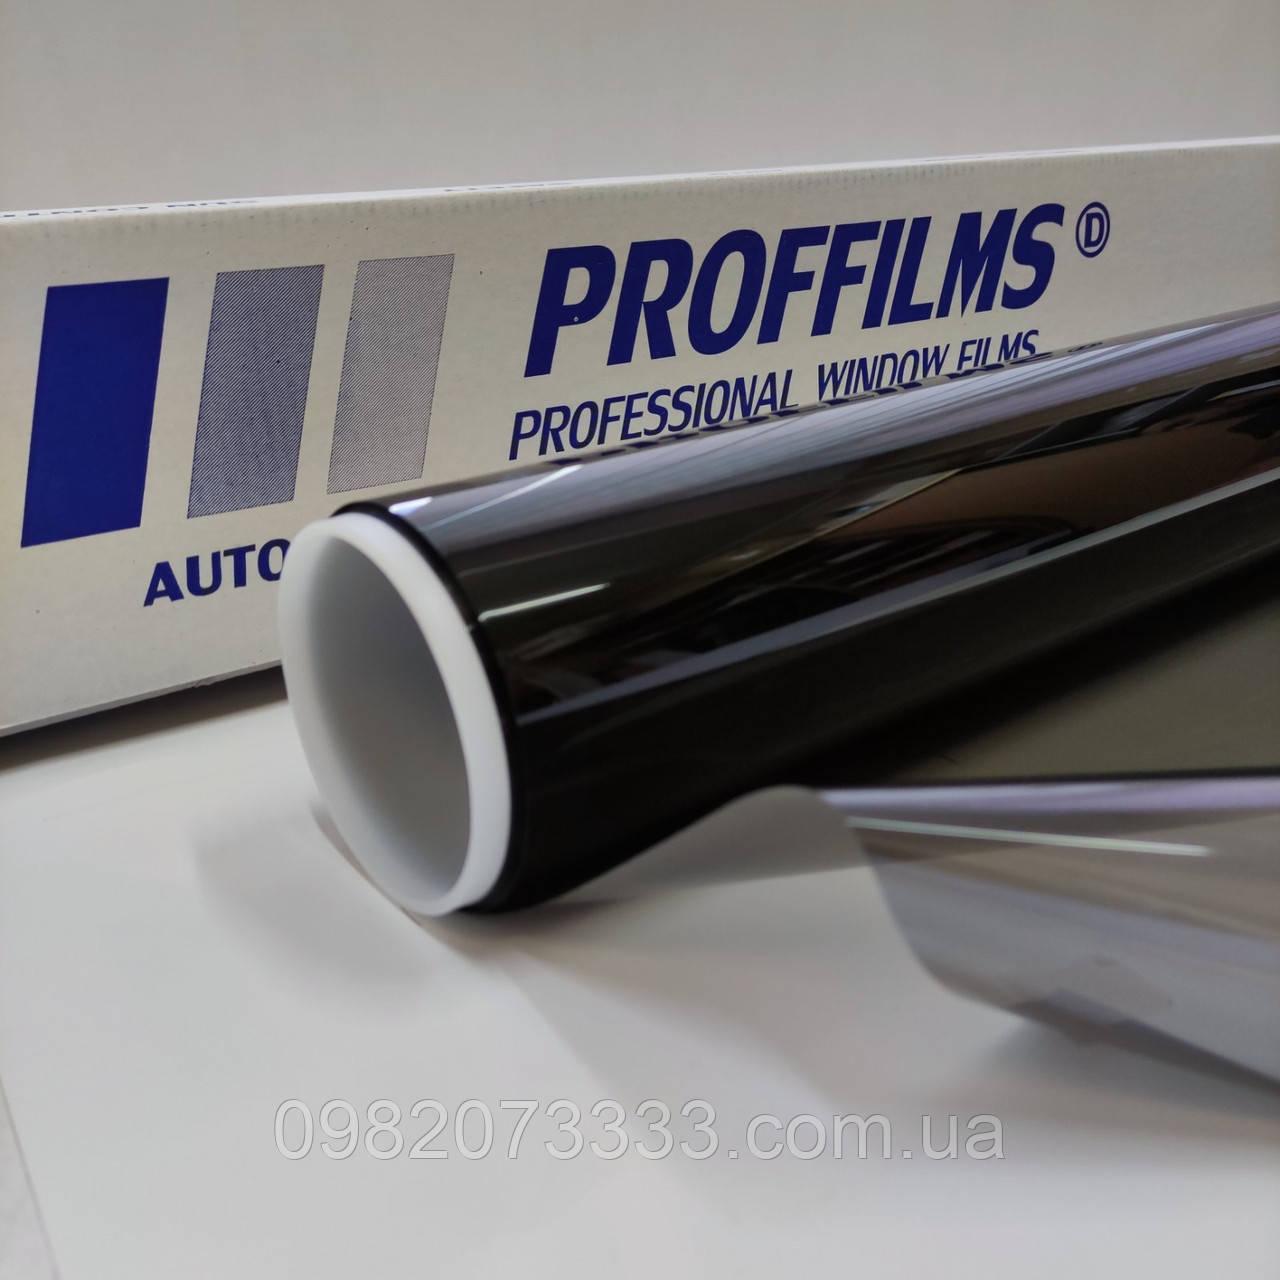 Автомобильная пленка PR CH 35% керамическая для авто. Плівка тонувальна ширина рулона 1,524 (цена за кв.м)